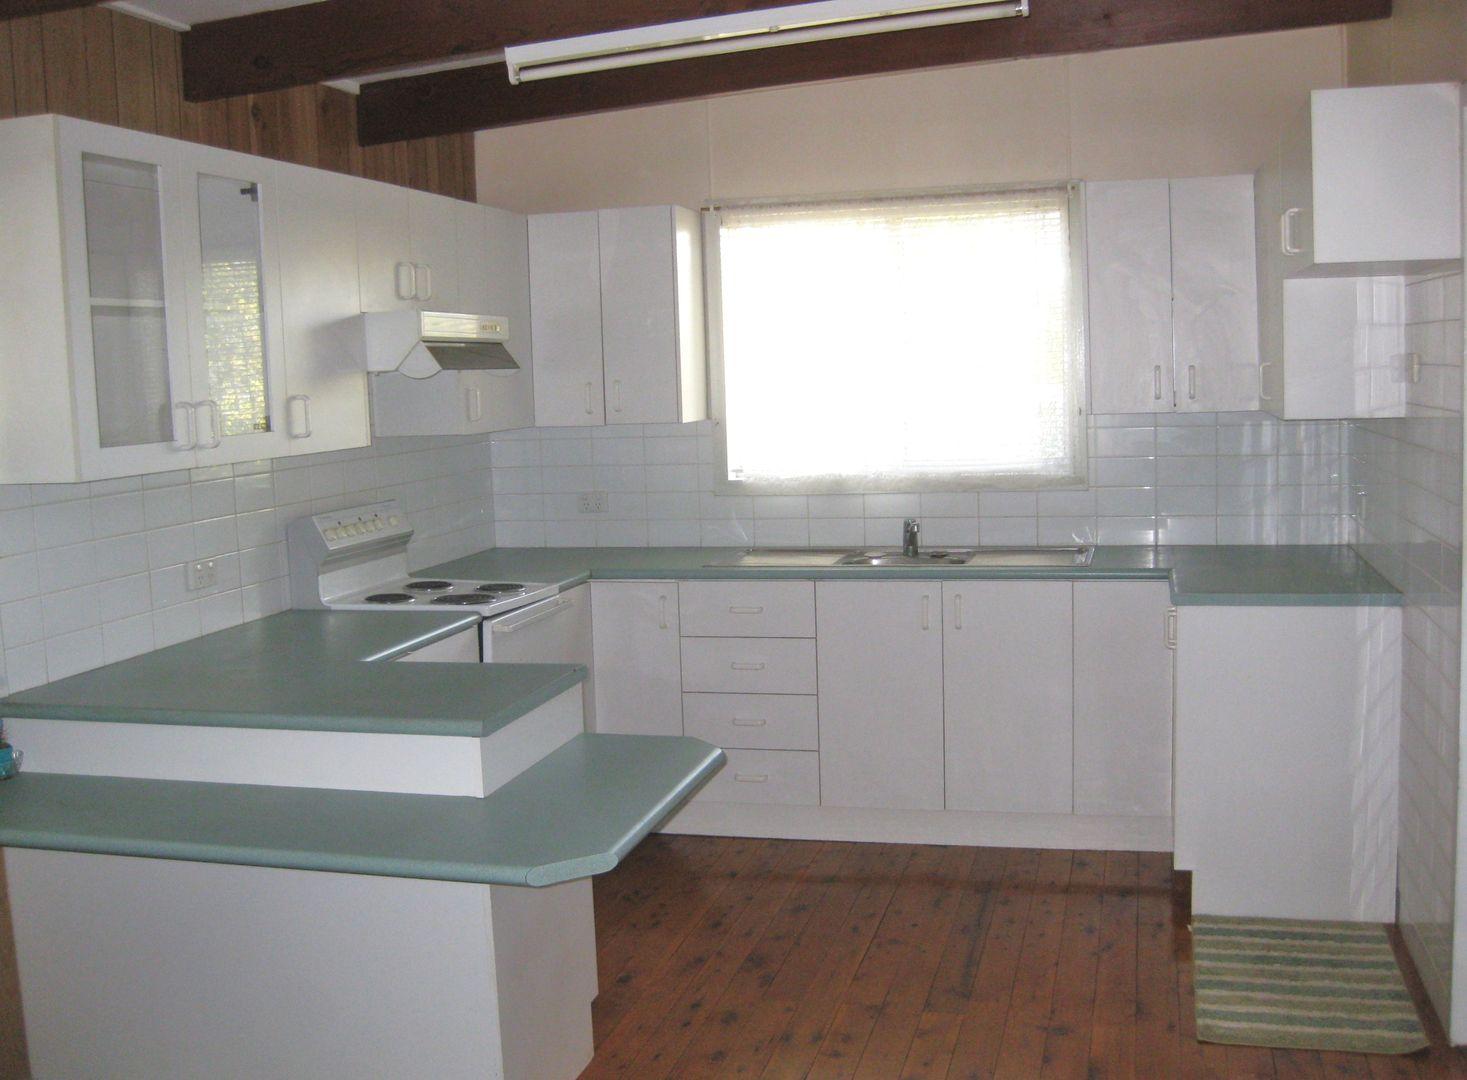 Neate, Coonabarabran NSW 2357, Image 2